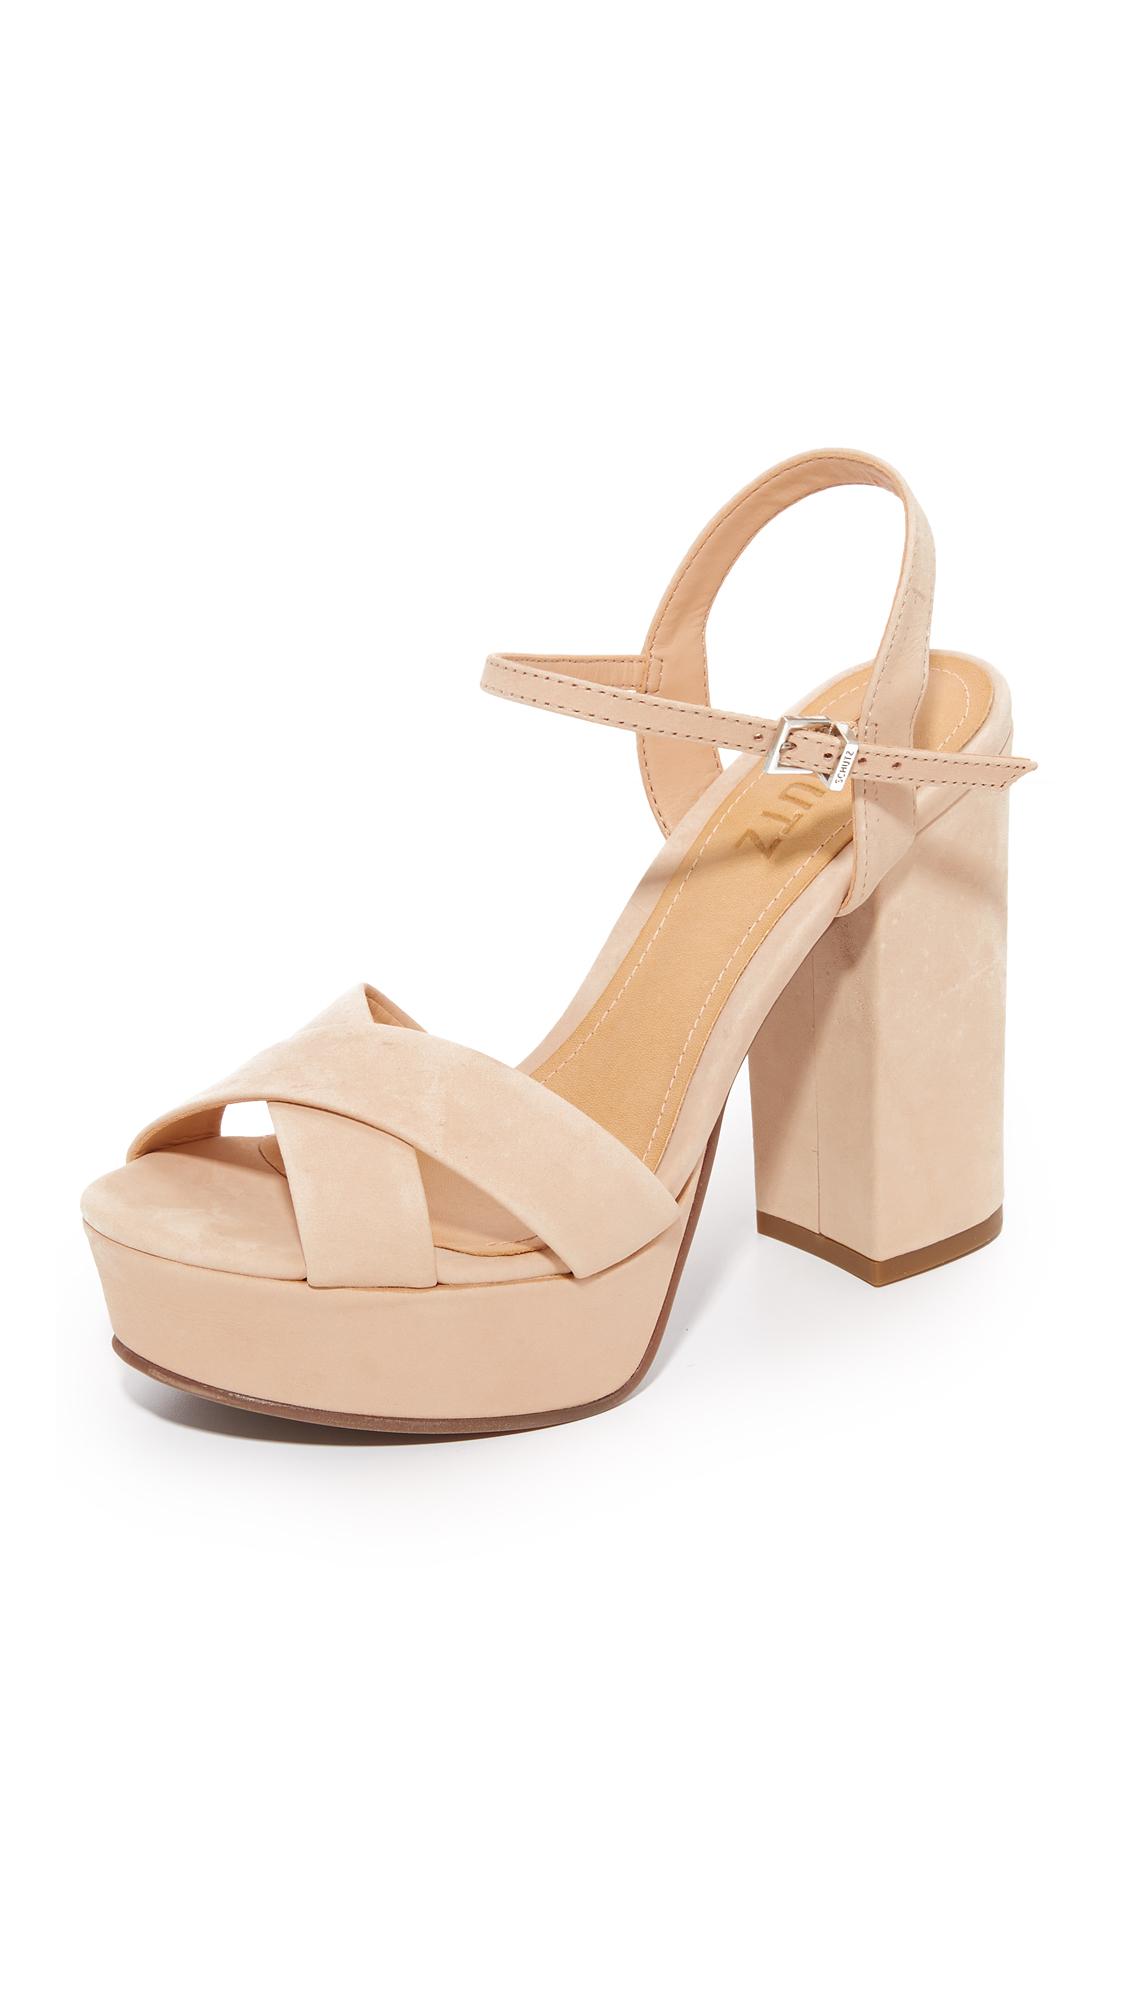 Schutz Samanta Platform Sandals - Tanino Ii